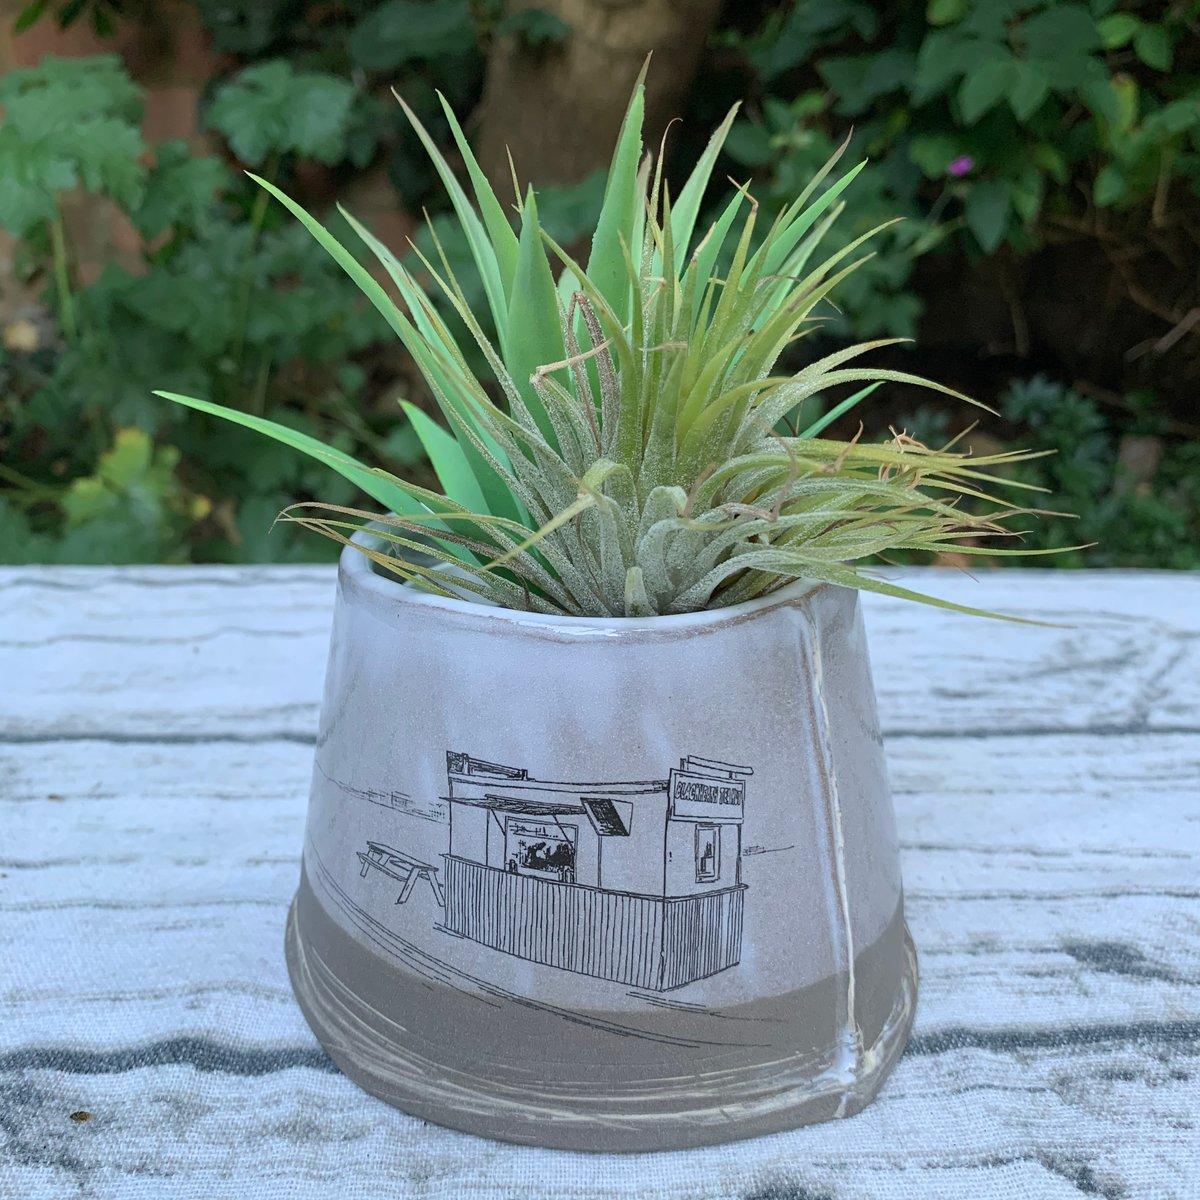 Small shorter anthracite jar, Blackheath Tea Hut